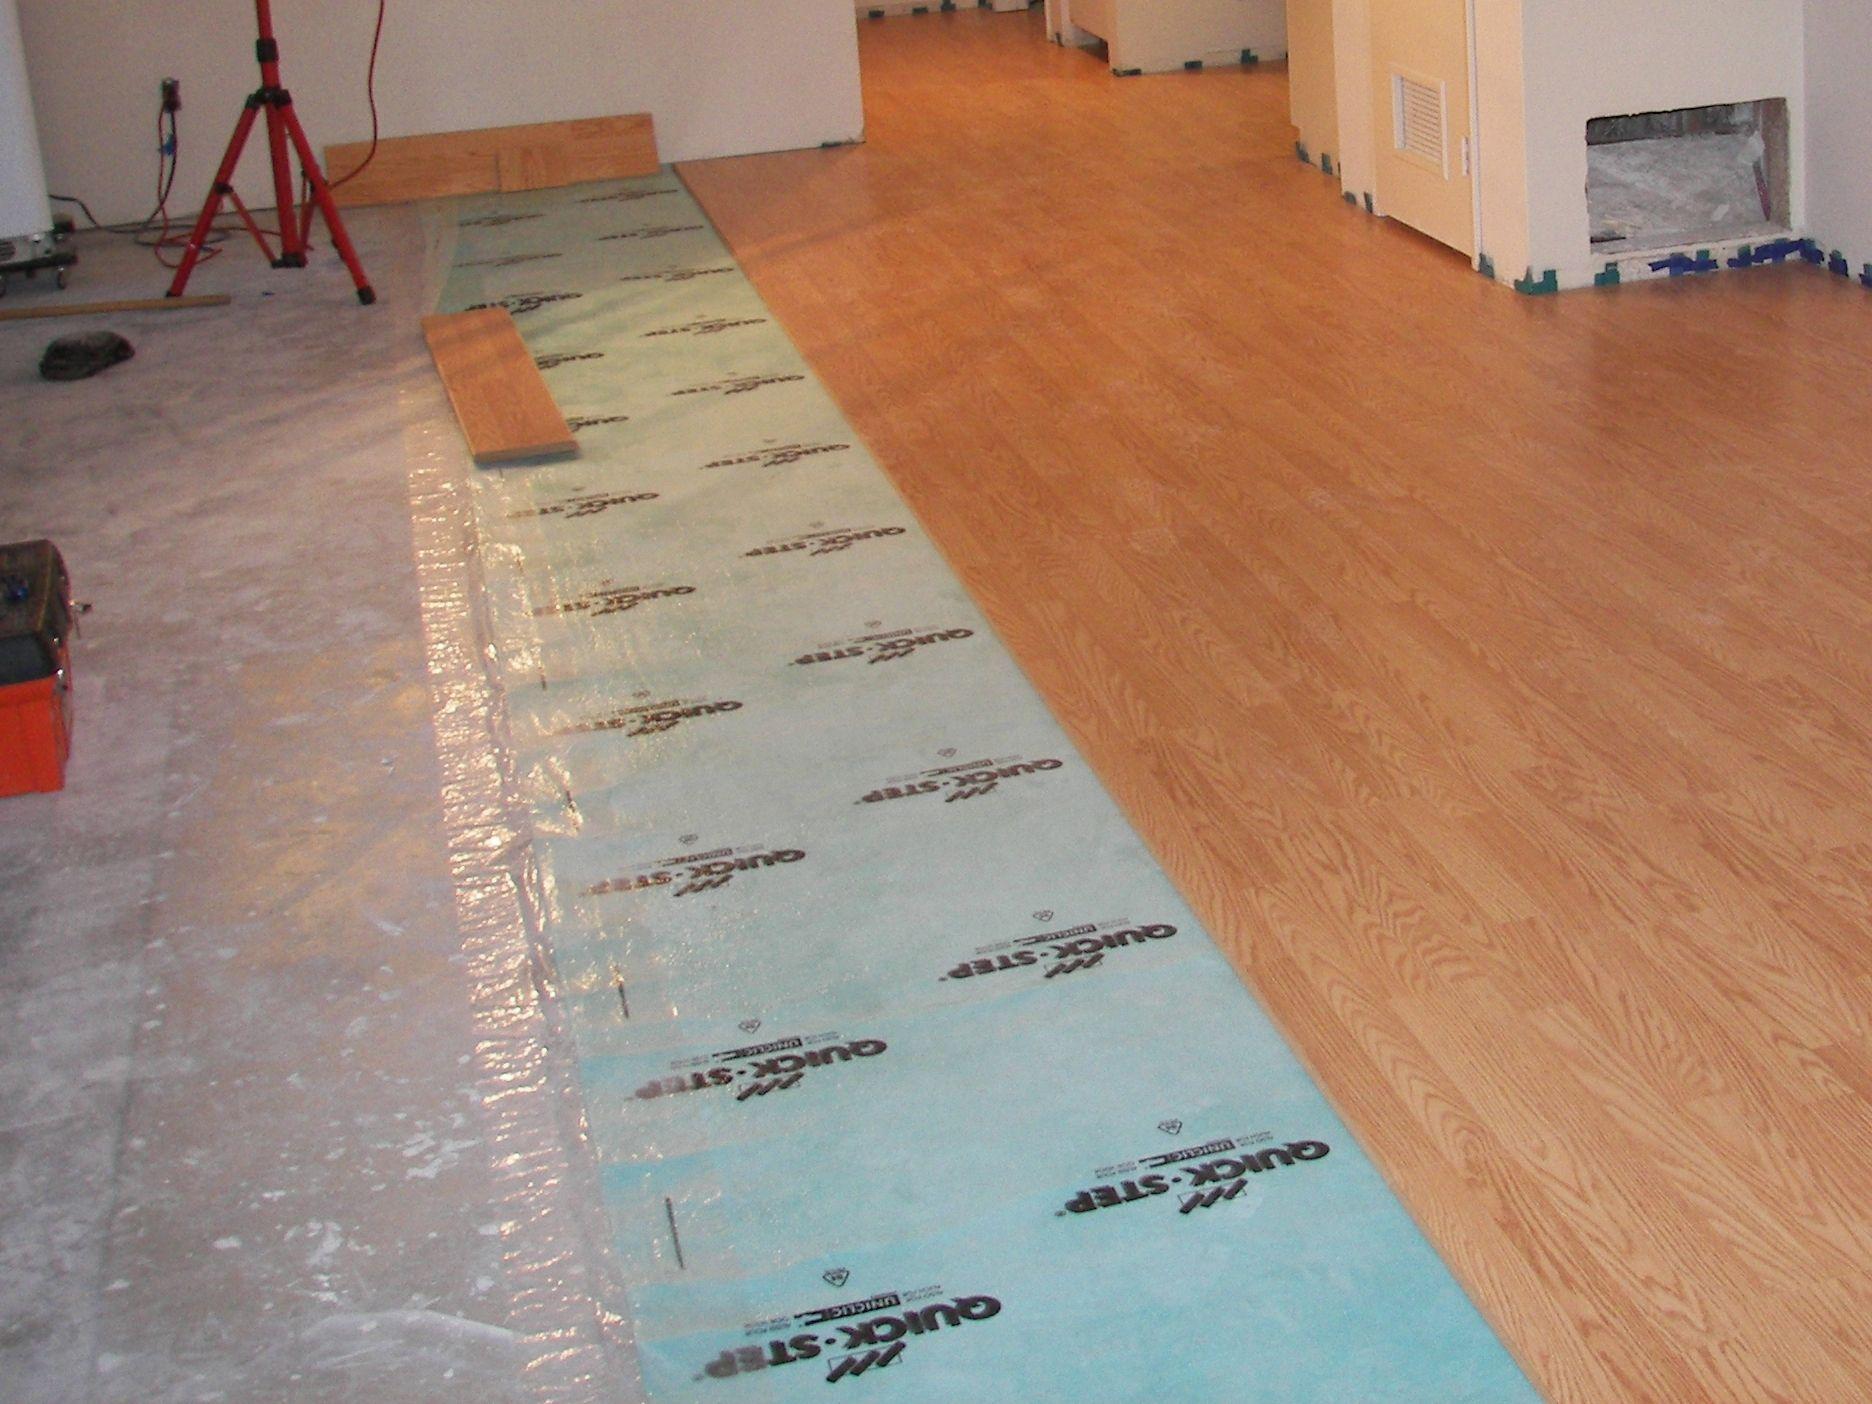 Hardwood Floor On Concrete Basement Bamboo Hardwood Flooring Engineered Wood Floors Wood Laminate Flooring